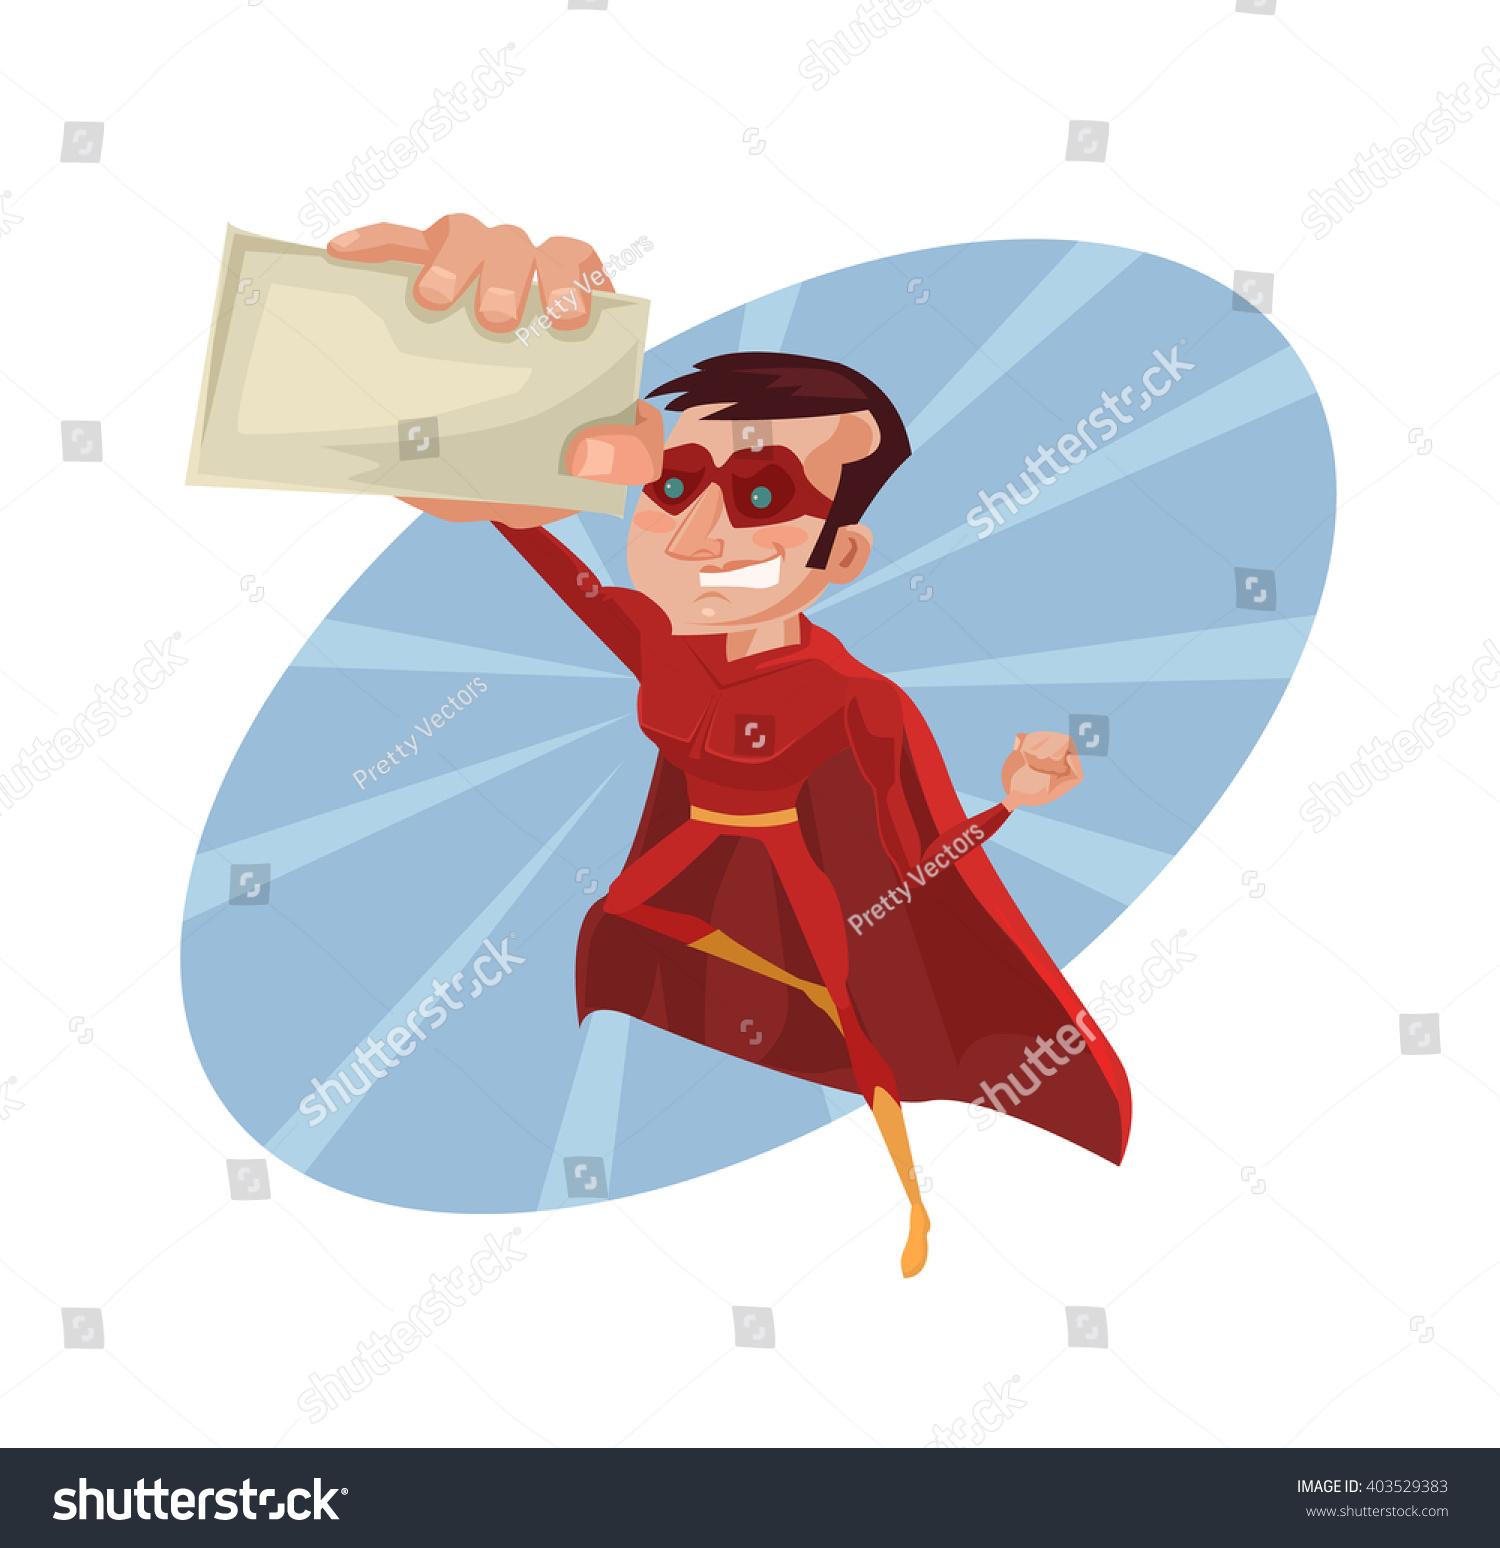 Superhero Business Card Vector Flat Cartoon Stock Vector 403529383 ...